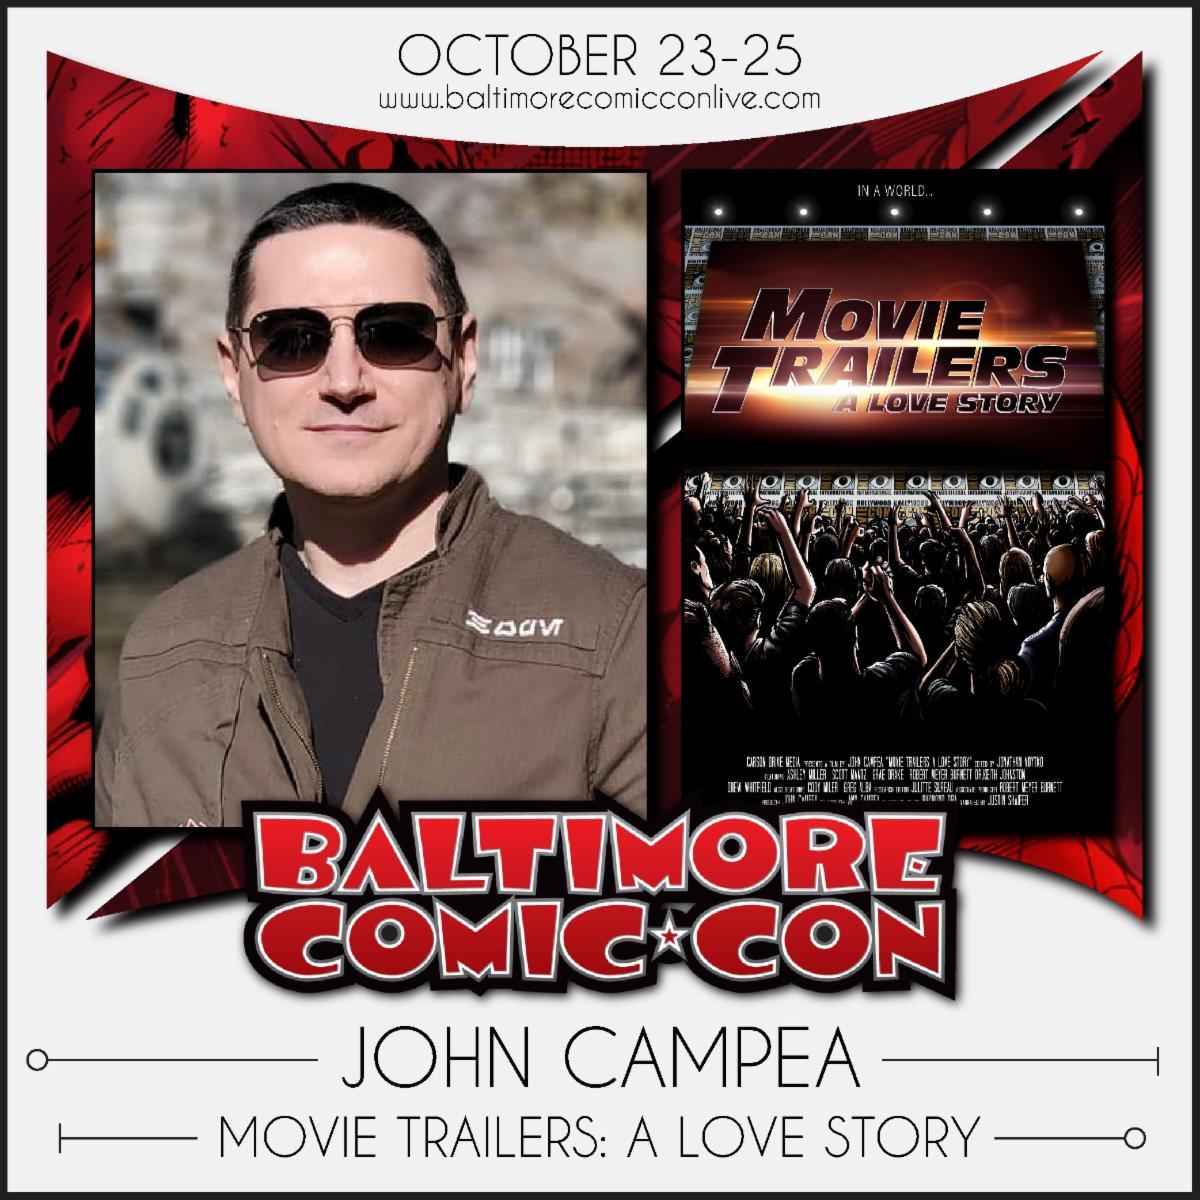 John Campea